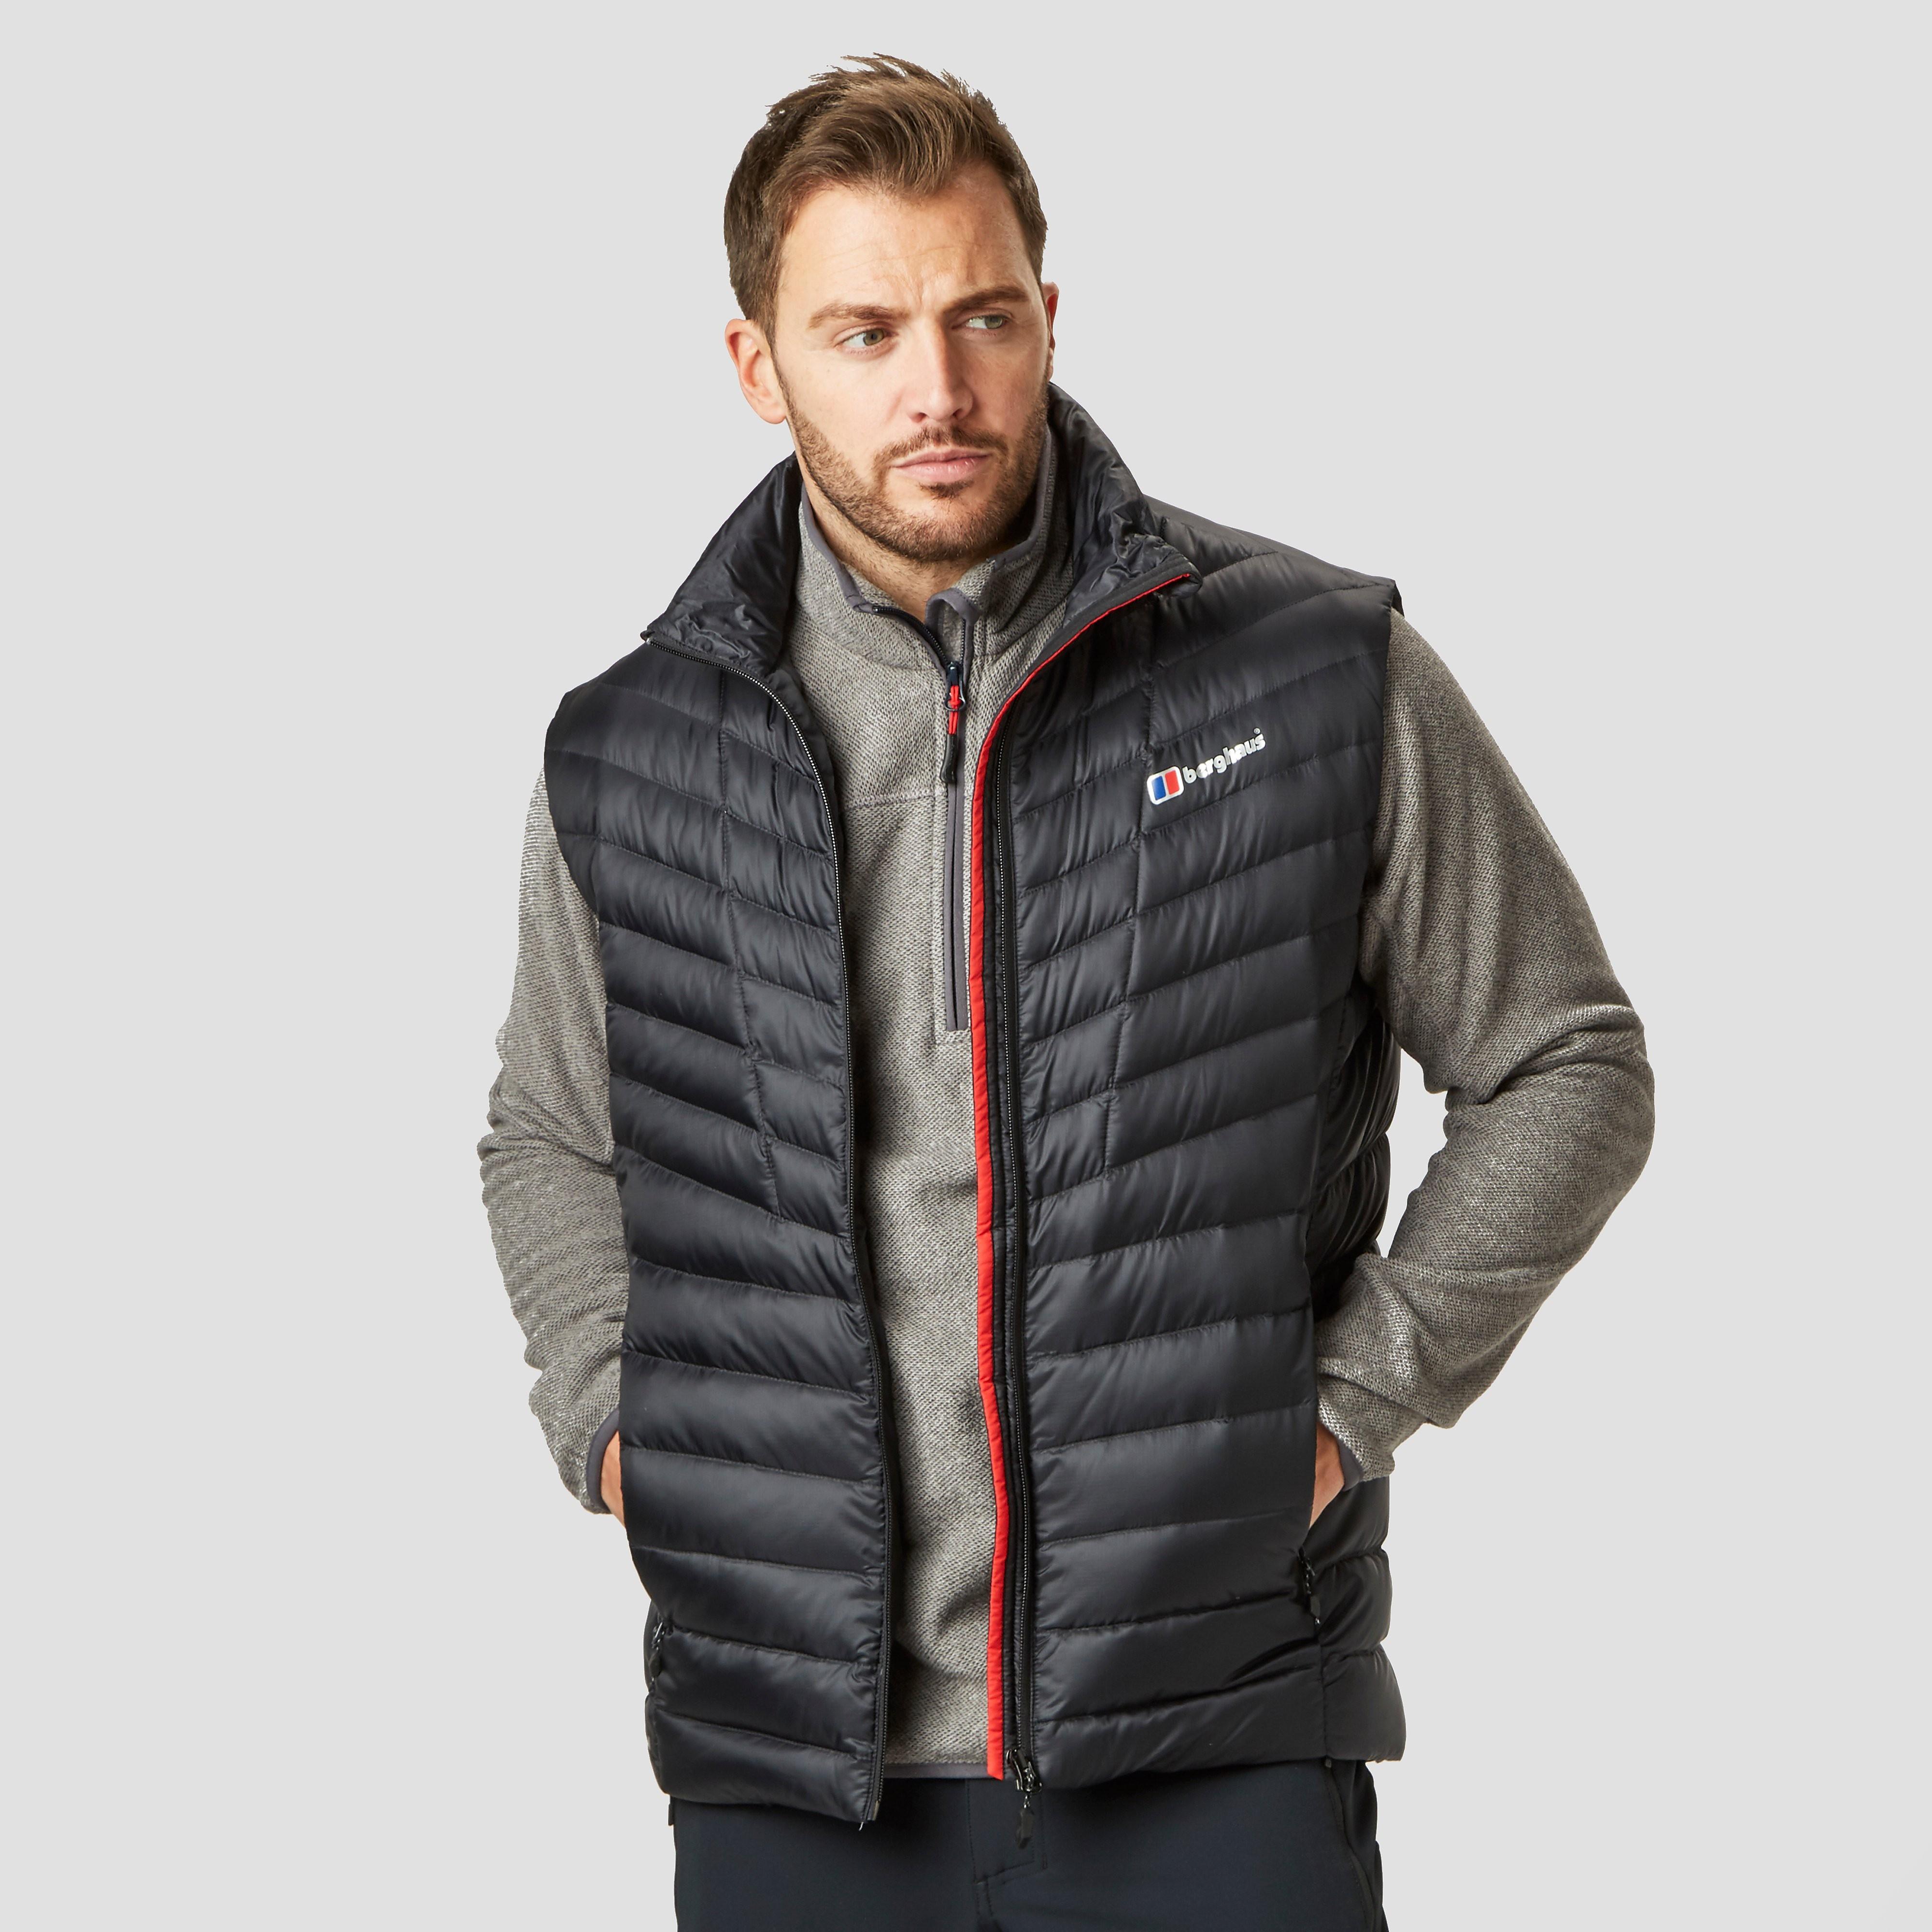 Berghaus Men's Tephra Vest Jacket